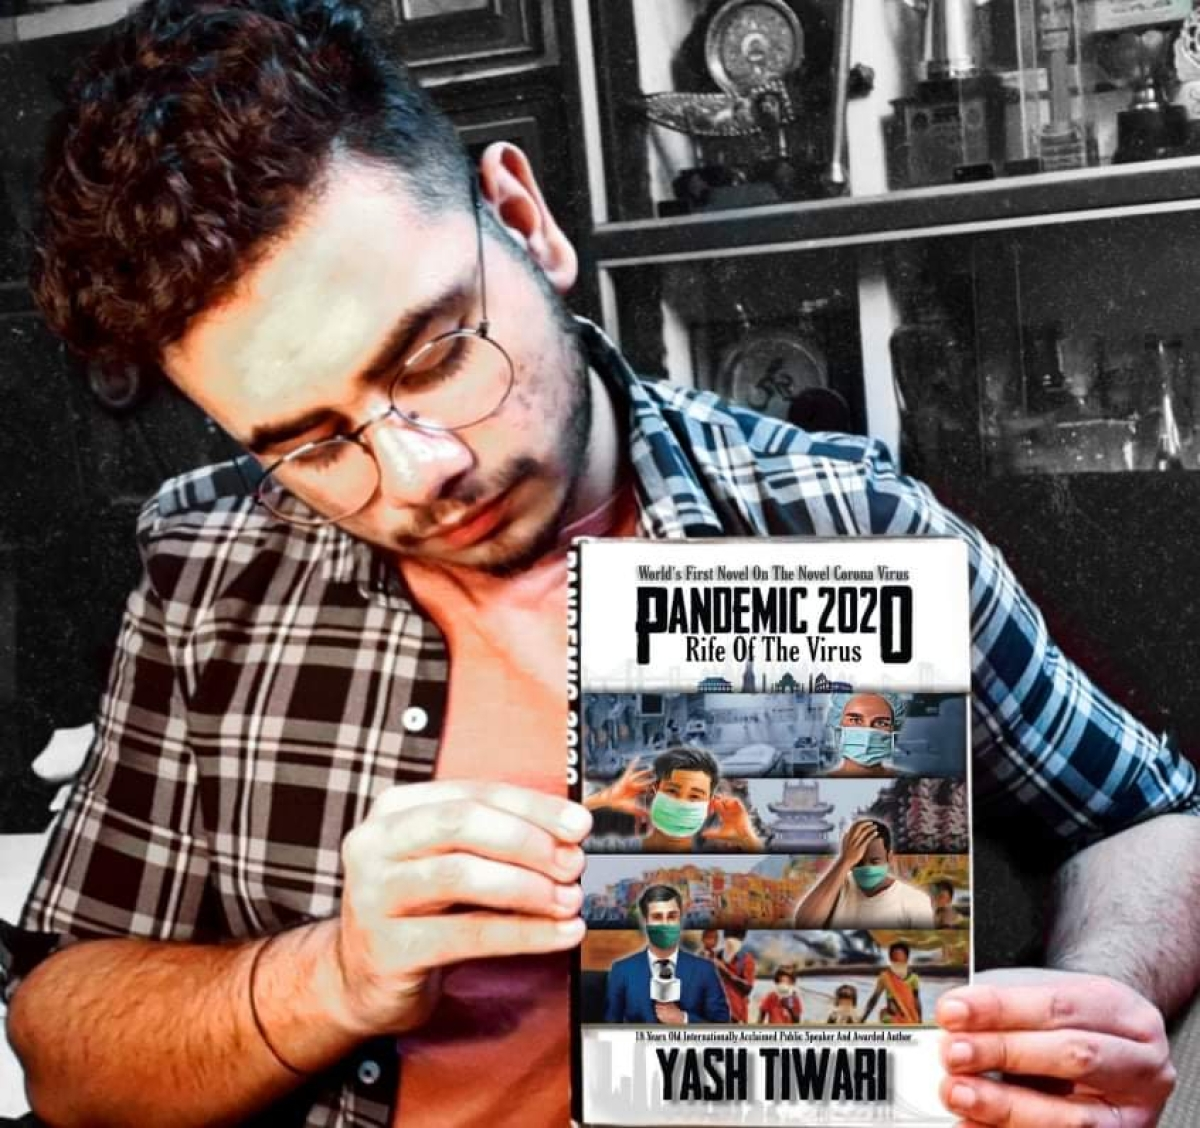 In Picture: Yash Tiwari and his book 'Pandemic 2020: Rife of the Virus'